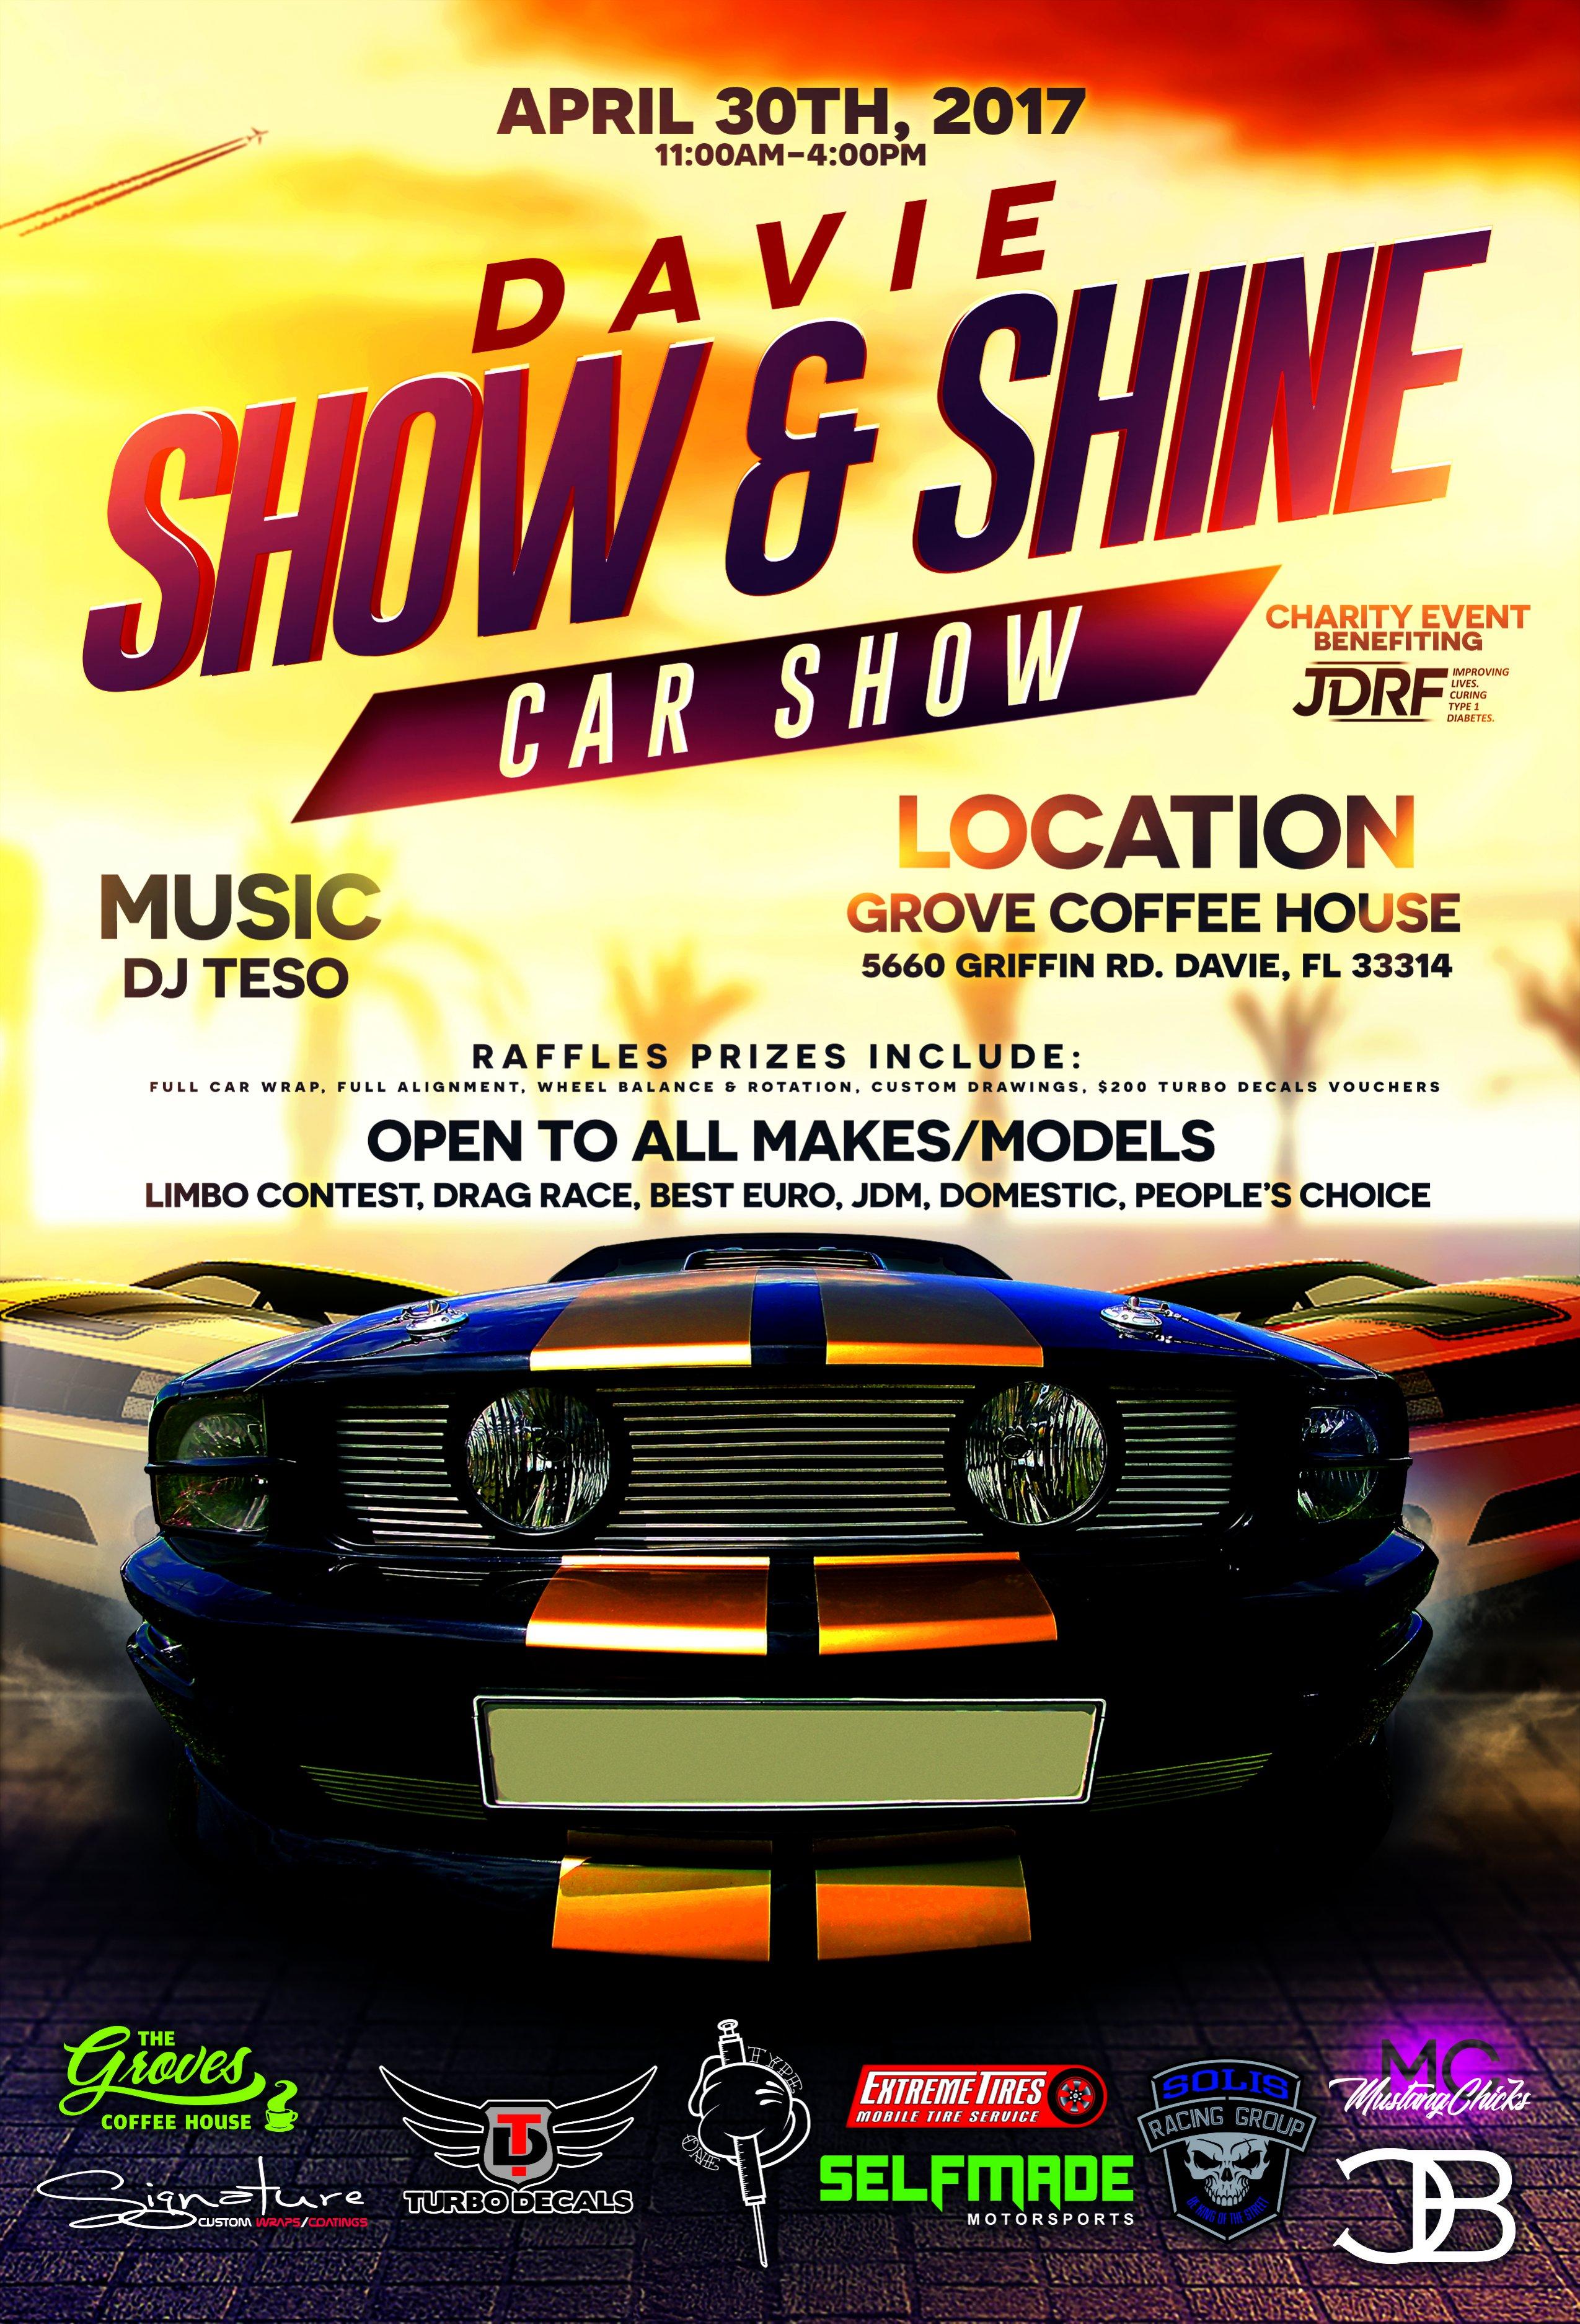 Click image for larger version  Name:Davie Show & Shine Car Show %28PRINT%29_2 (1).jpg Views:28 Size:1.14 MB ID:222529